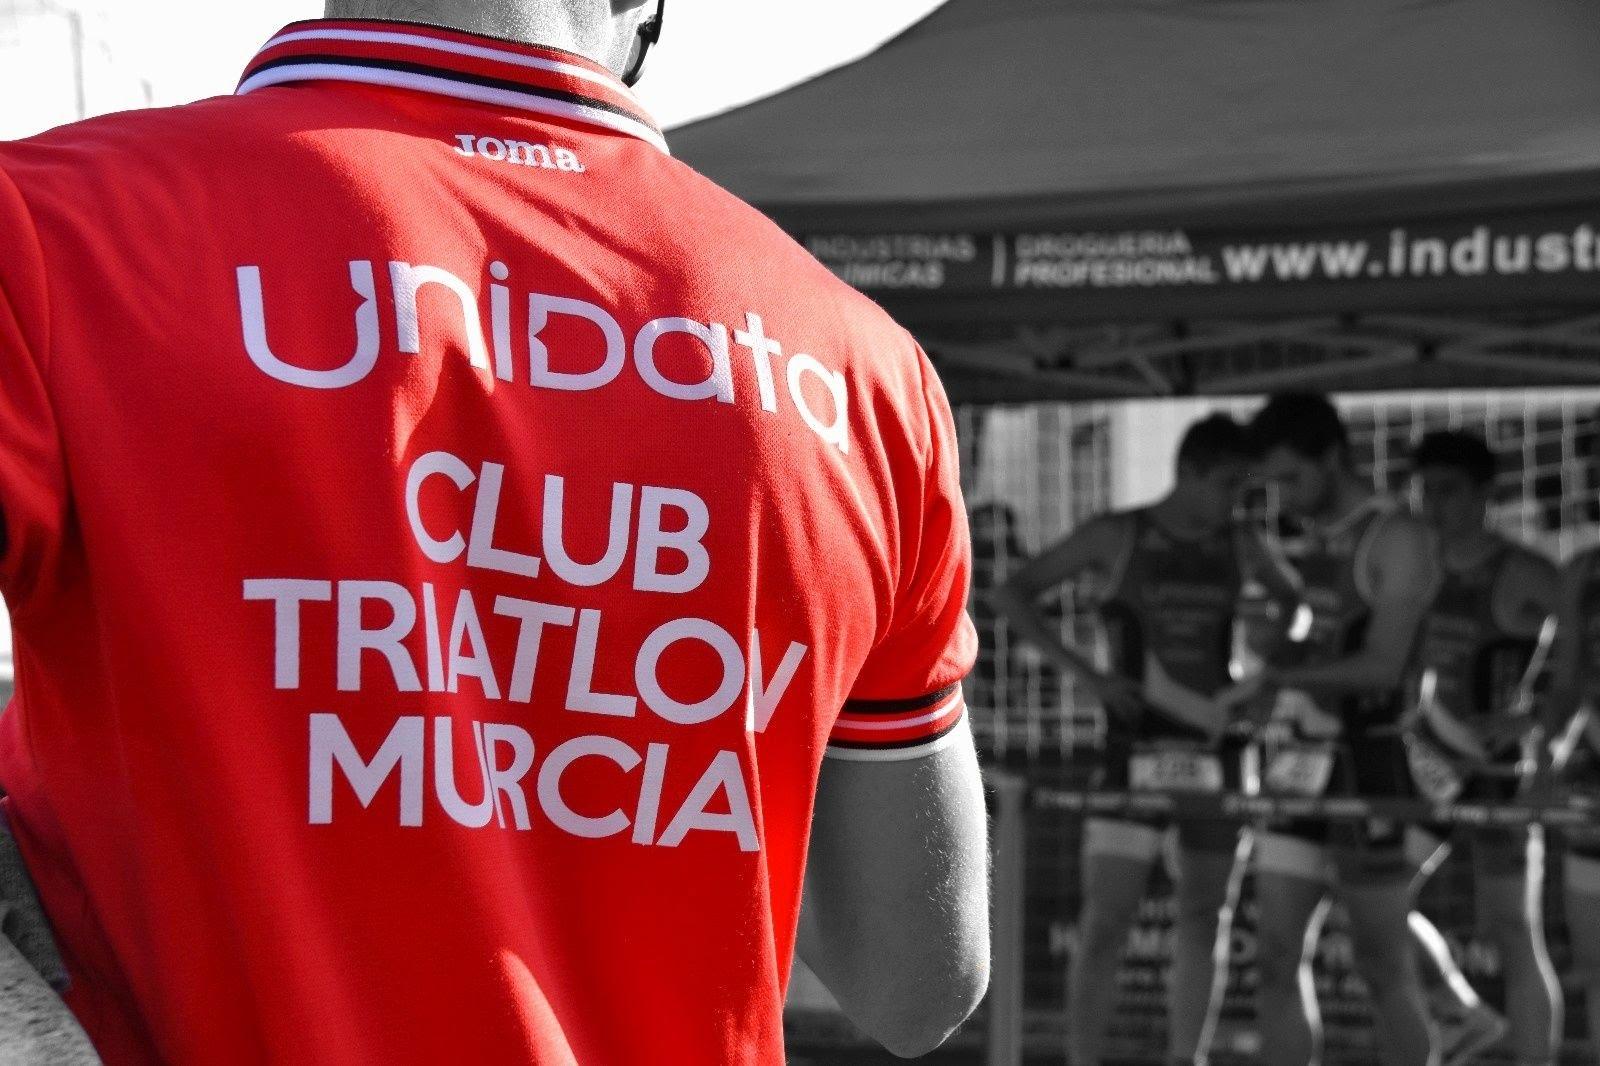 Club_Triatlon_Murcia_Unidata__Campeon_Regional_Duatln_por_Equipos_2018__Triatlon_Murcia_Archena_Femenino_4